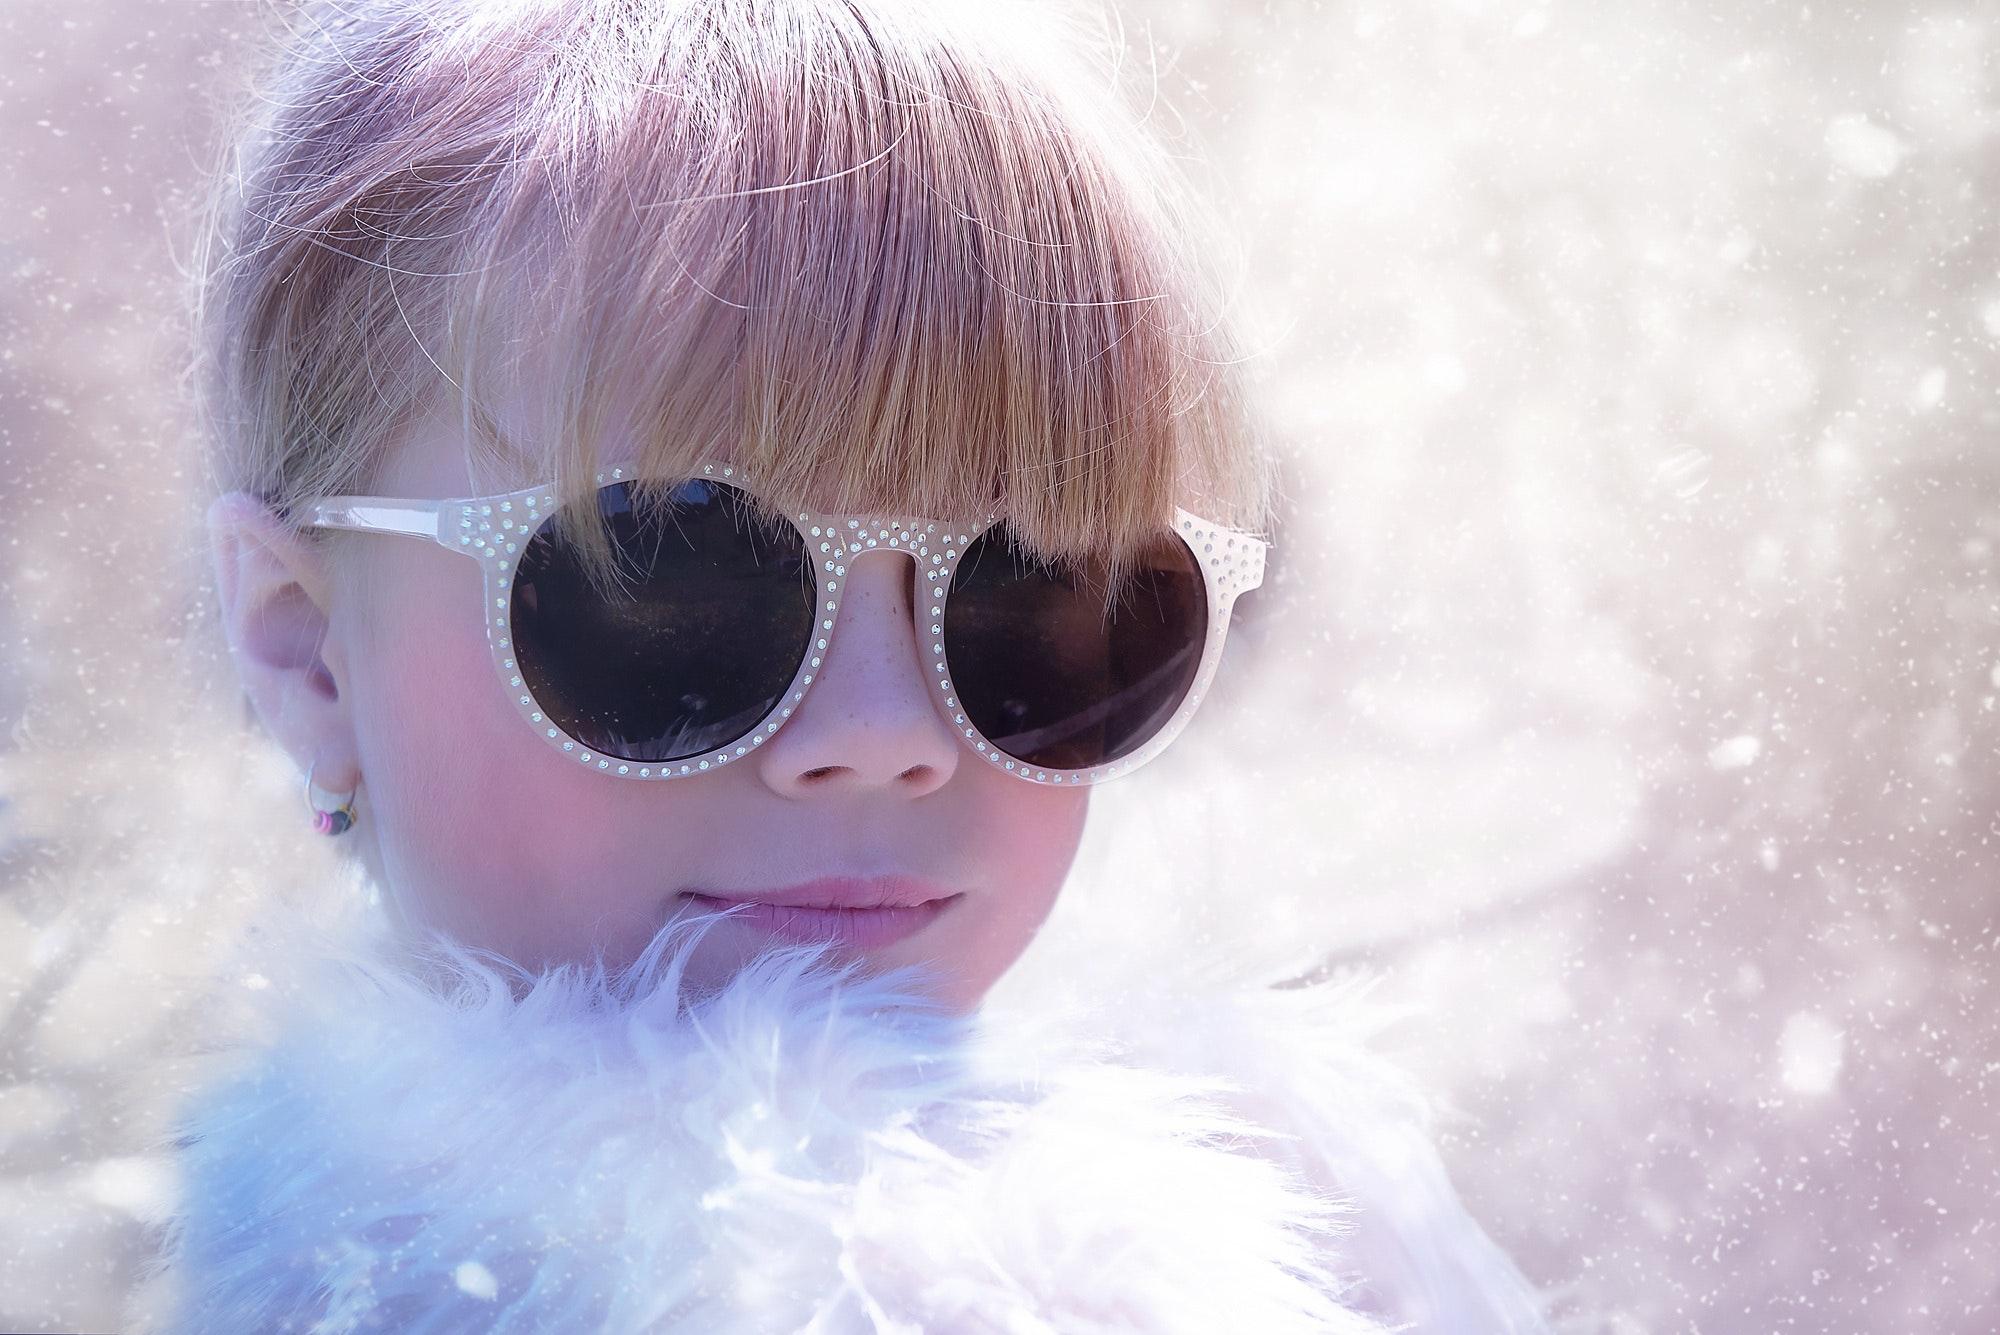 blond-child-close-35632.jpg